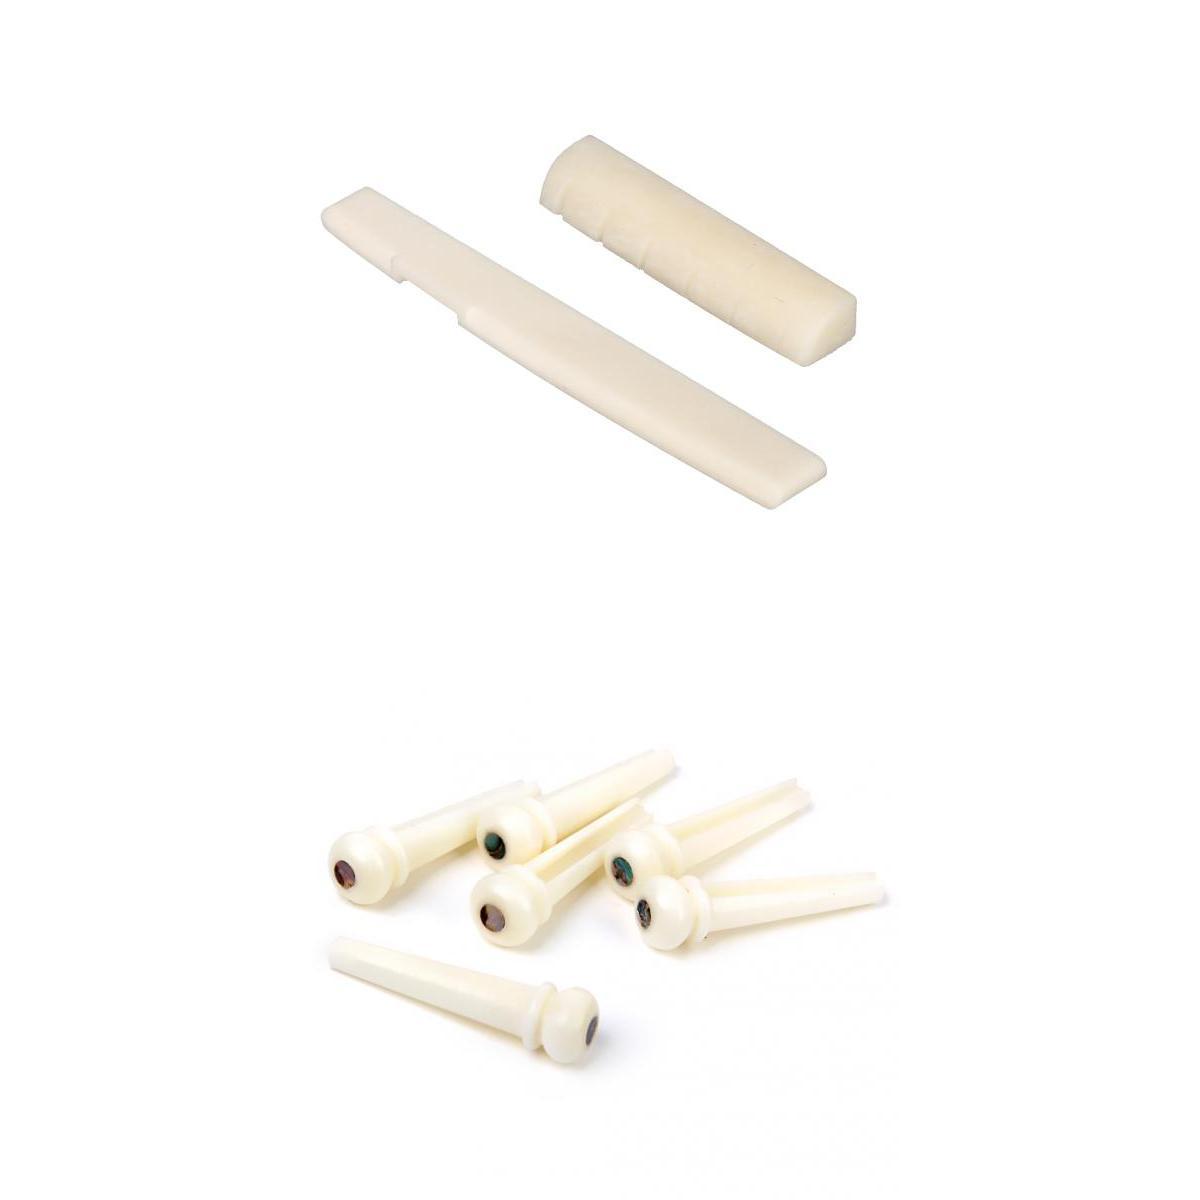 Bone Bridge Saddle+Nut Sloted+6pcs Endpin w/ Abalone Dot For Acoustic Guitar